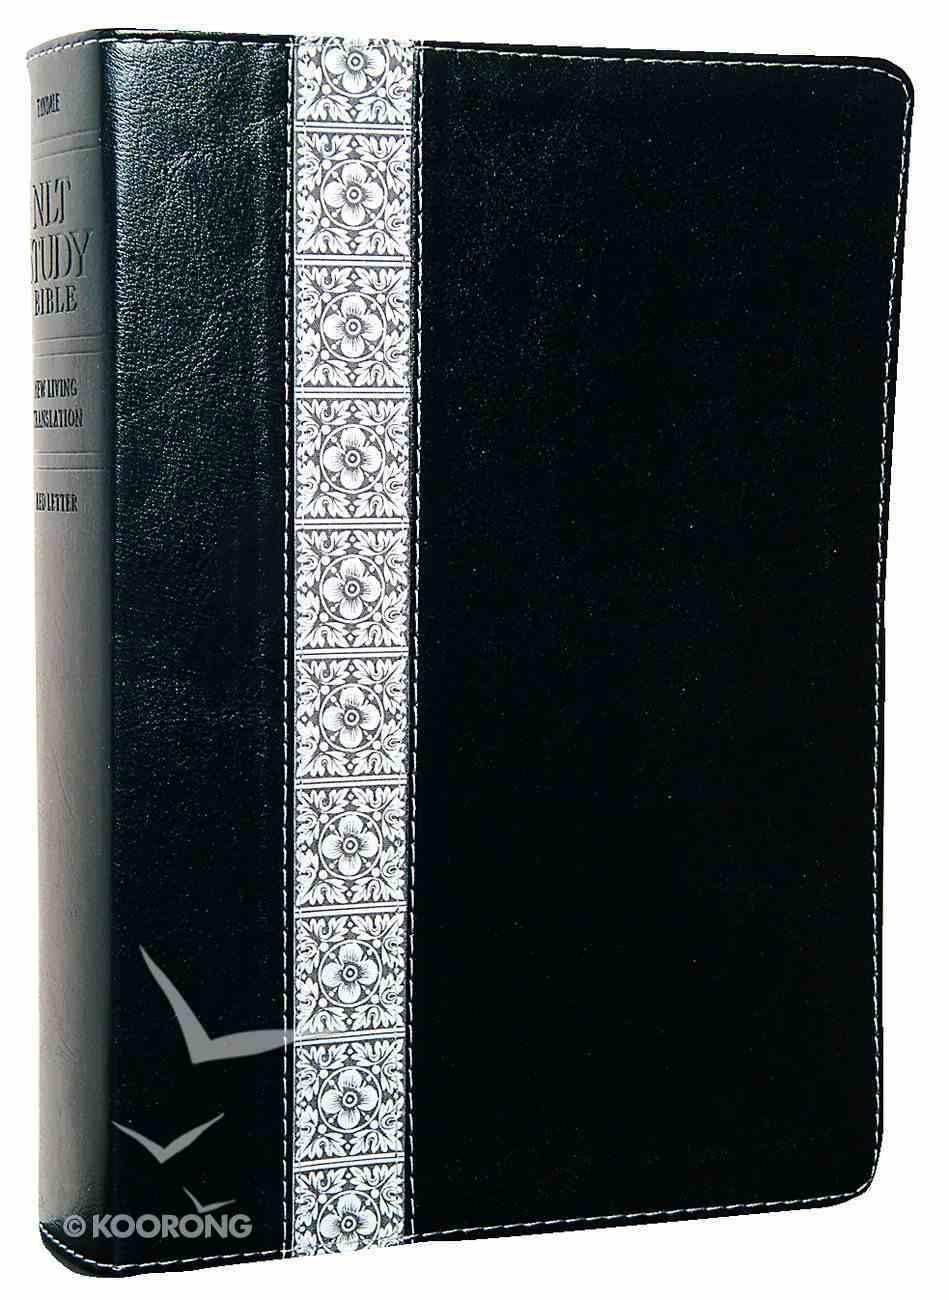 NLT Study Bible Black Fabric/White Floral Imitation Leather